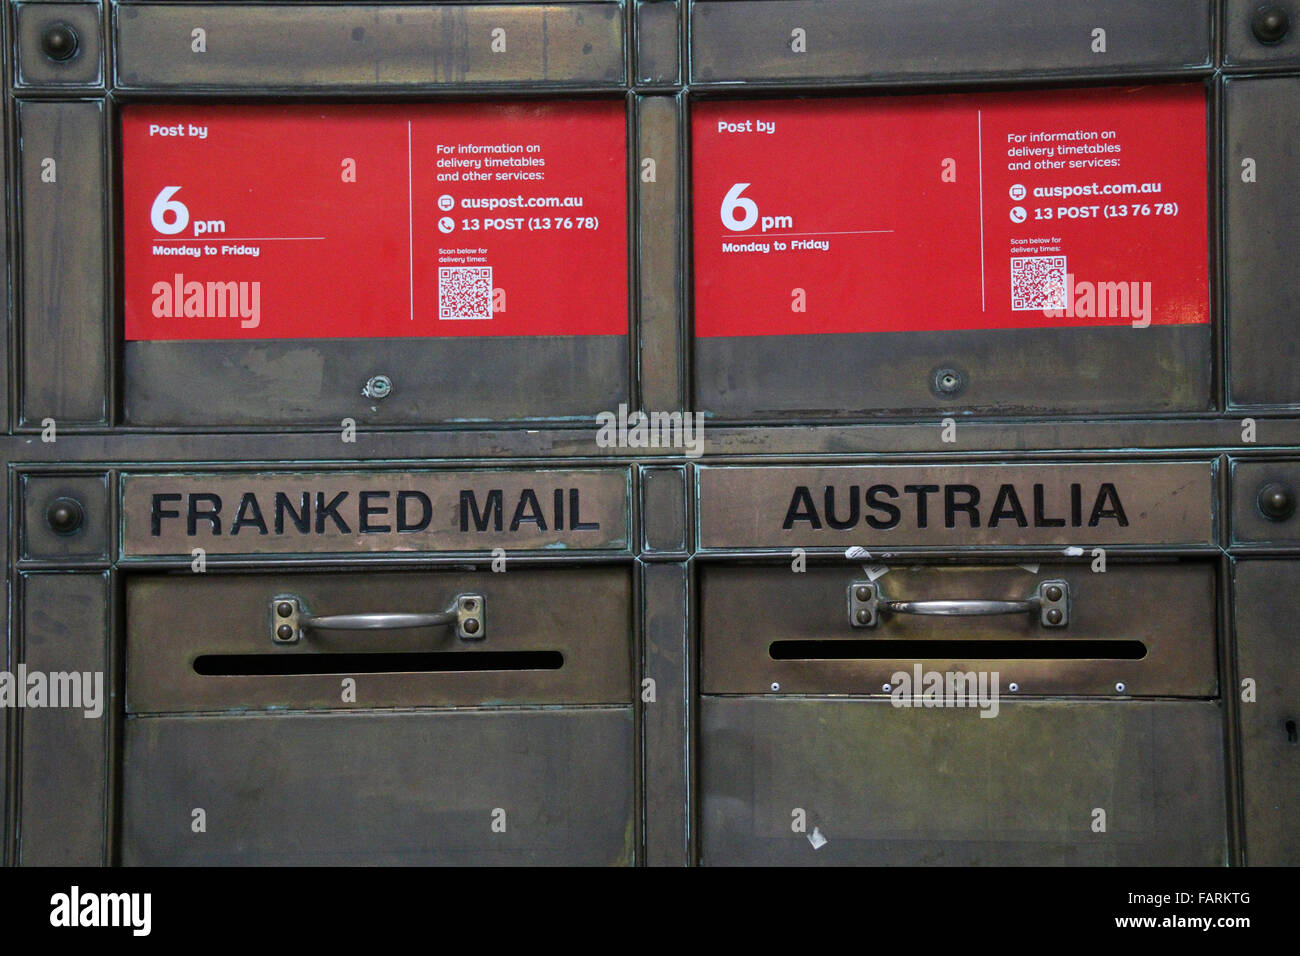 Australia Post Office Letter Boxes Stock Photos & Australia